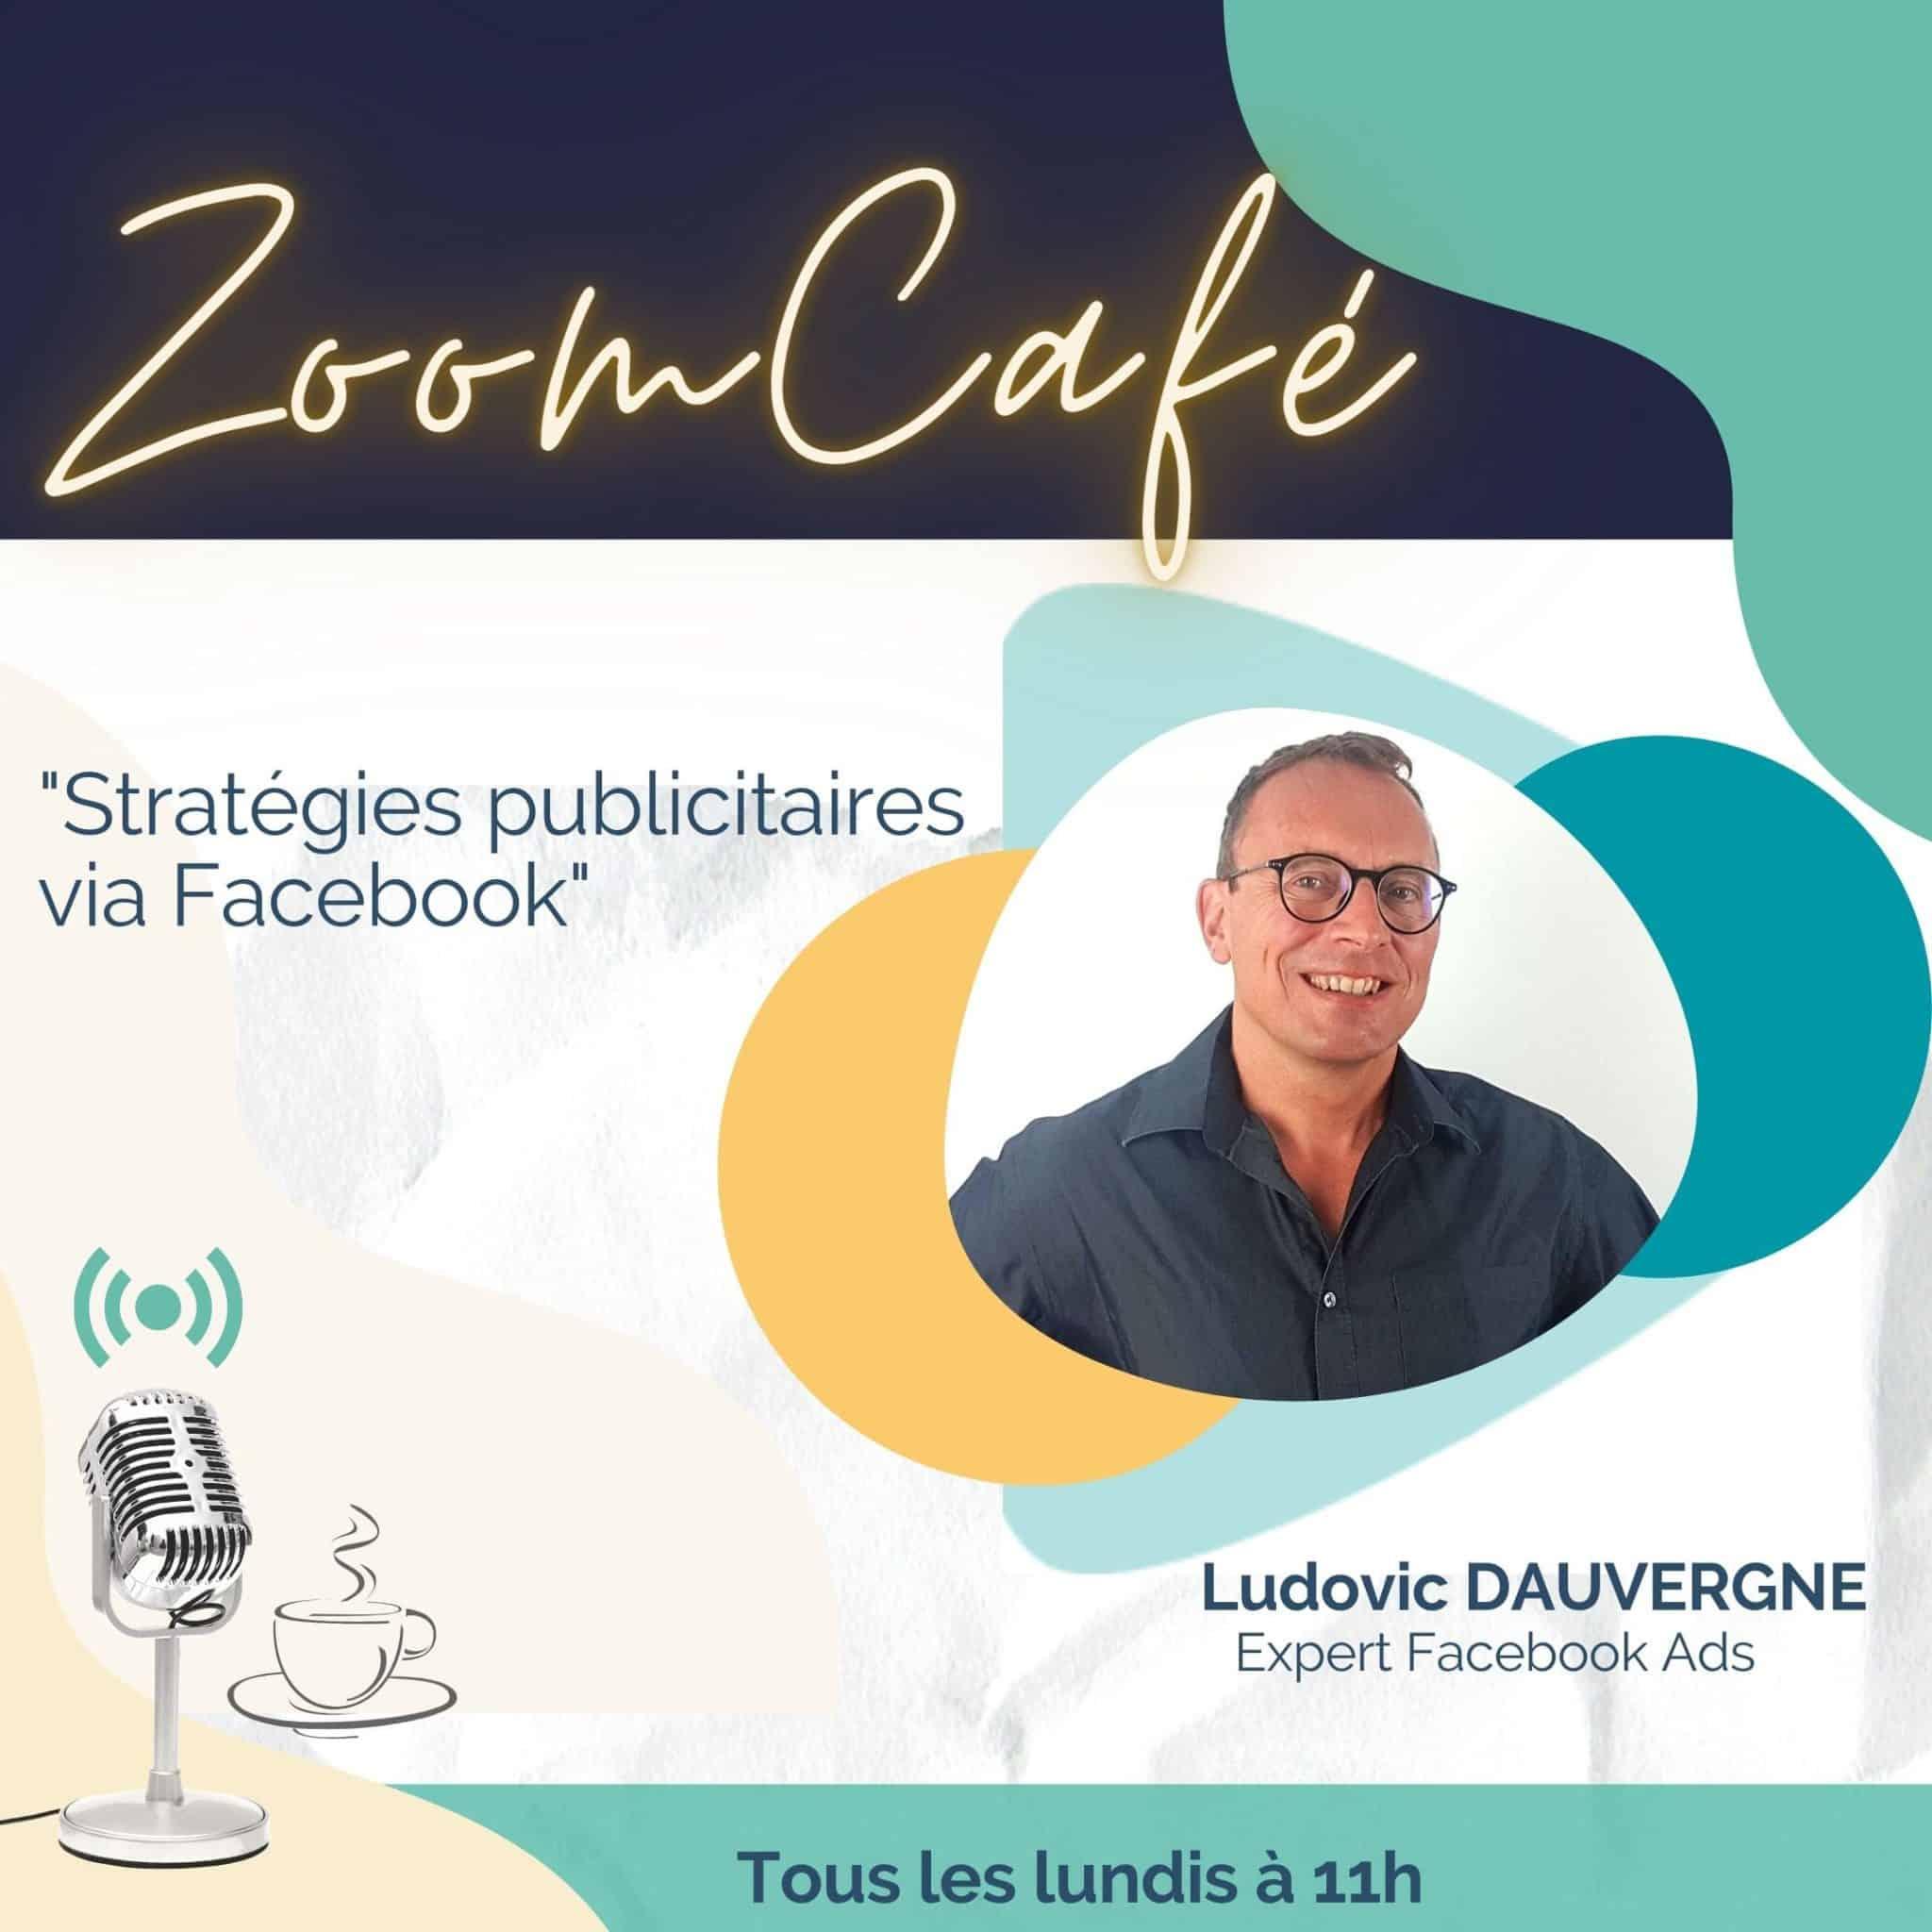 zoomcafe stratégies publicitaires via facebook